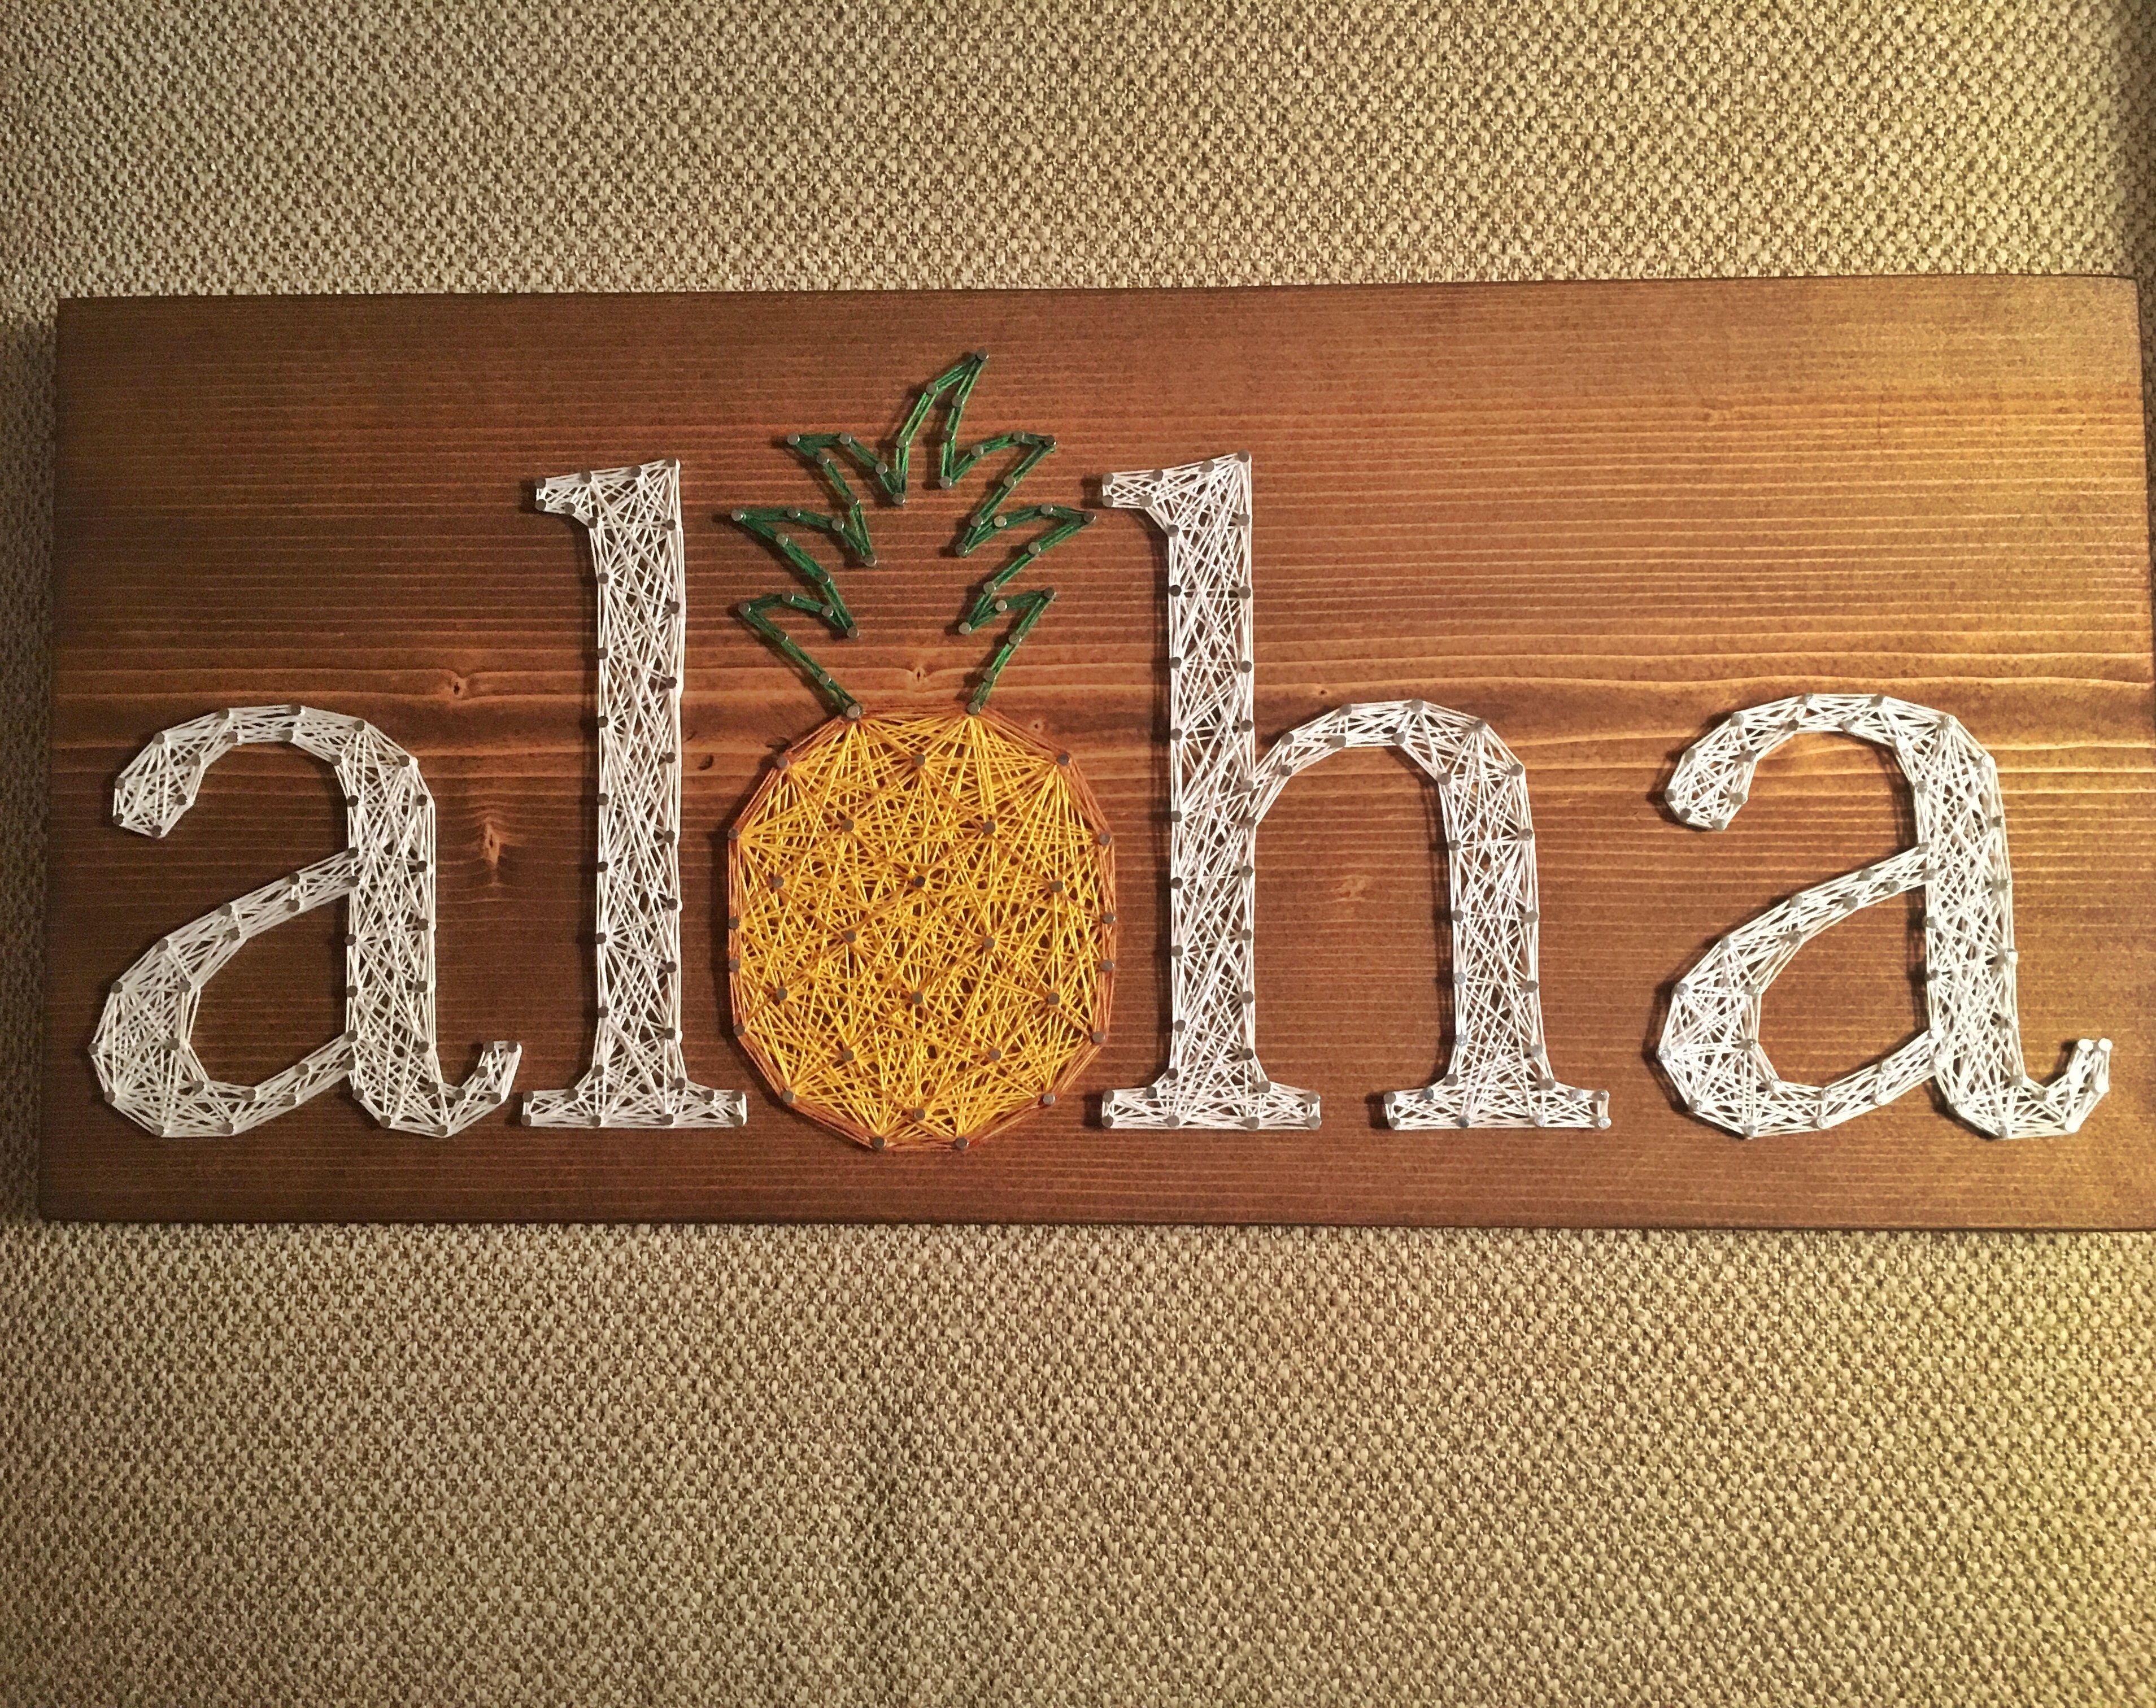 custom aloha pineapple string art, welcome sign, hawaii home decor